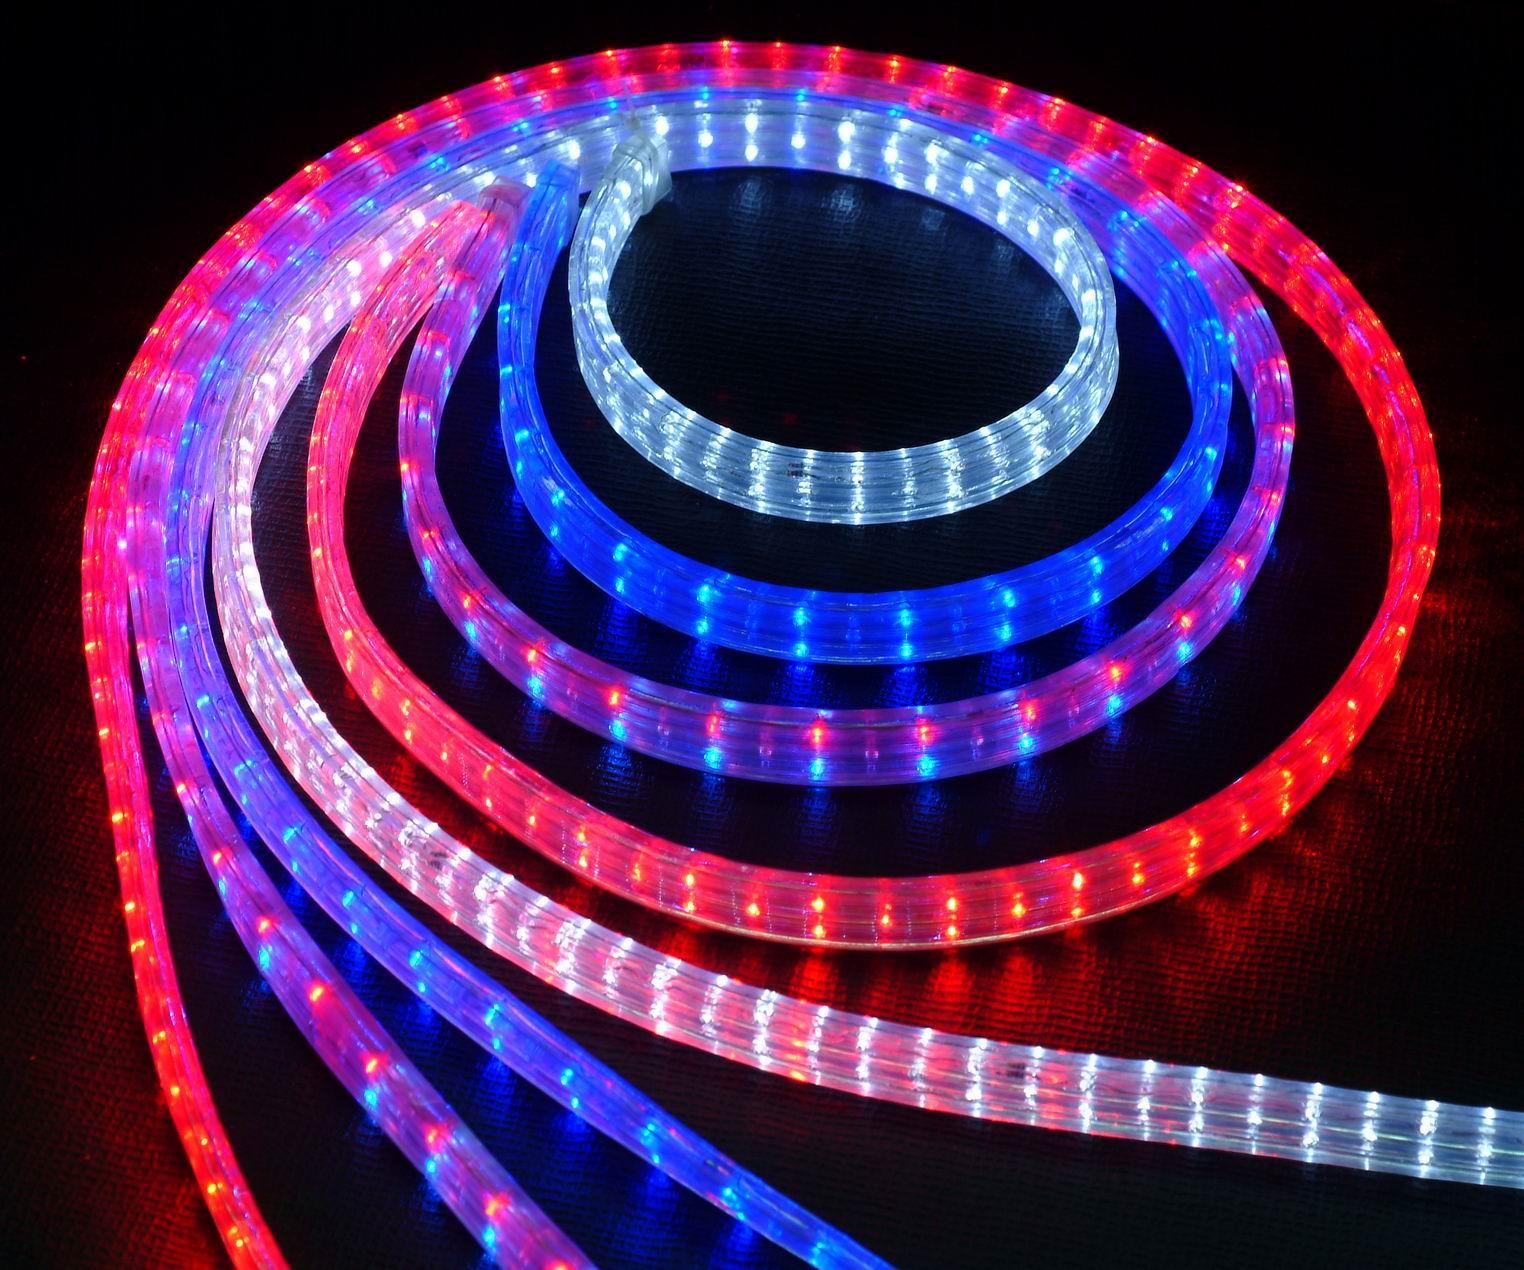 Middle east Series -Taizhou Shining Lighting & Gift Co., Ltd